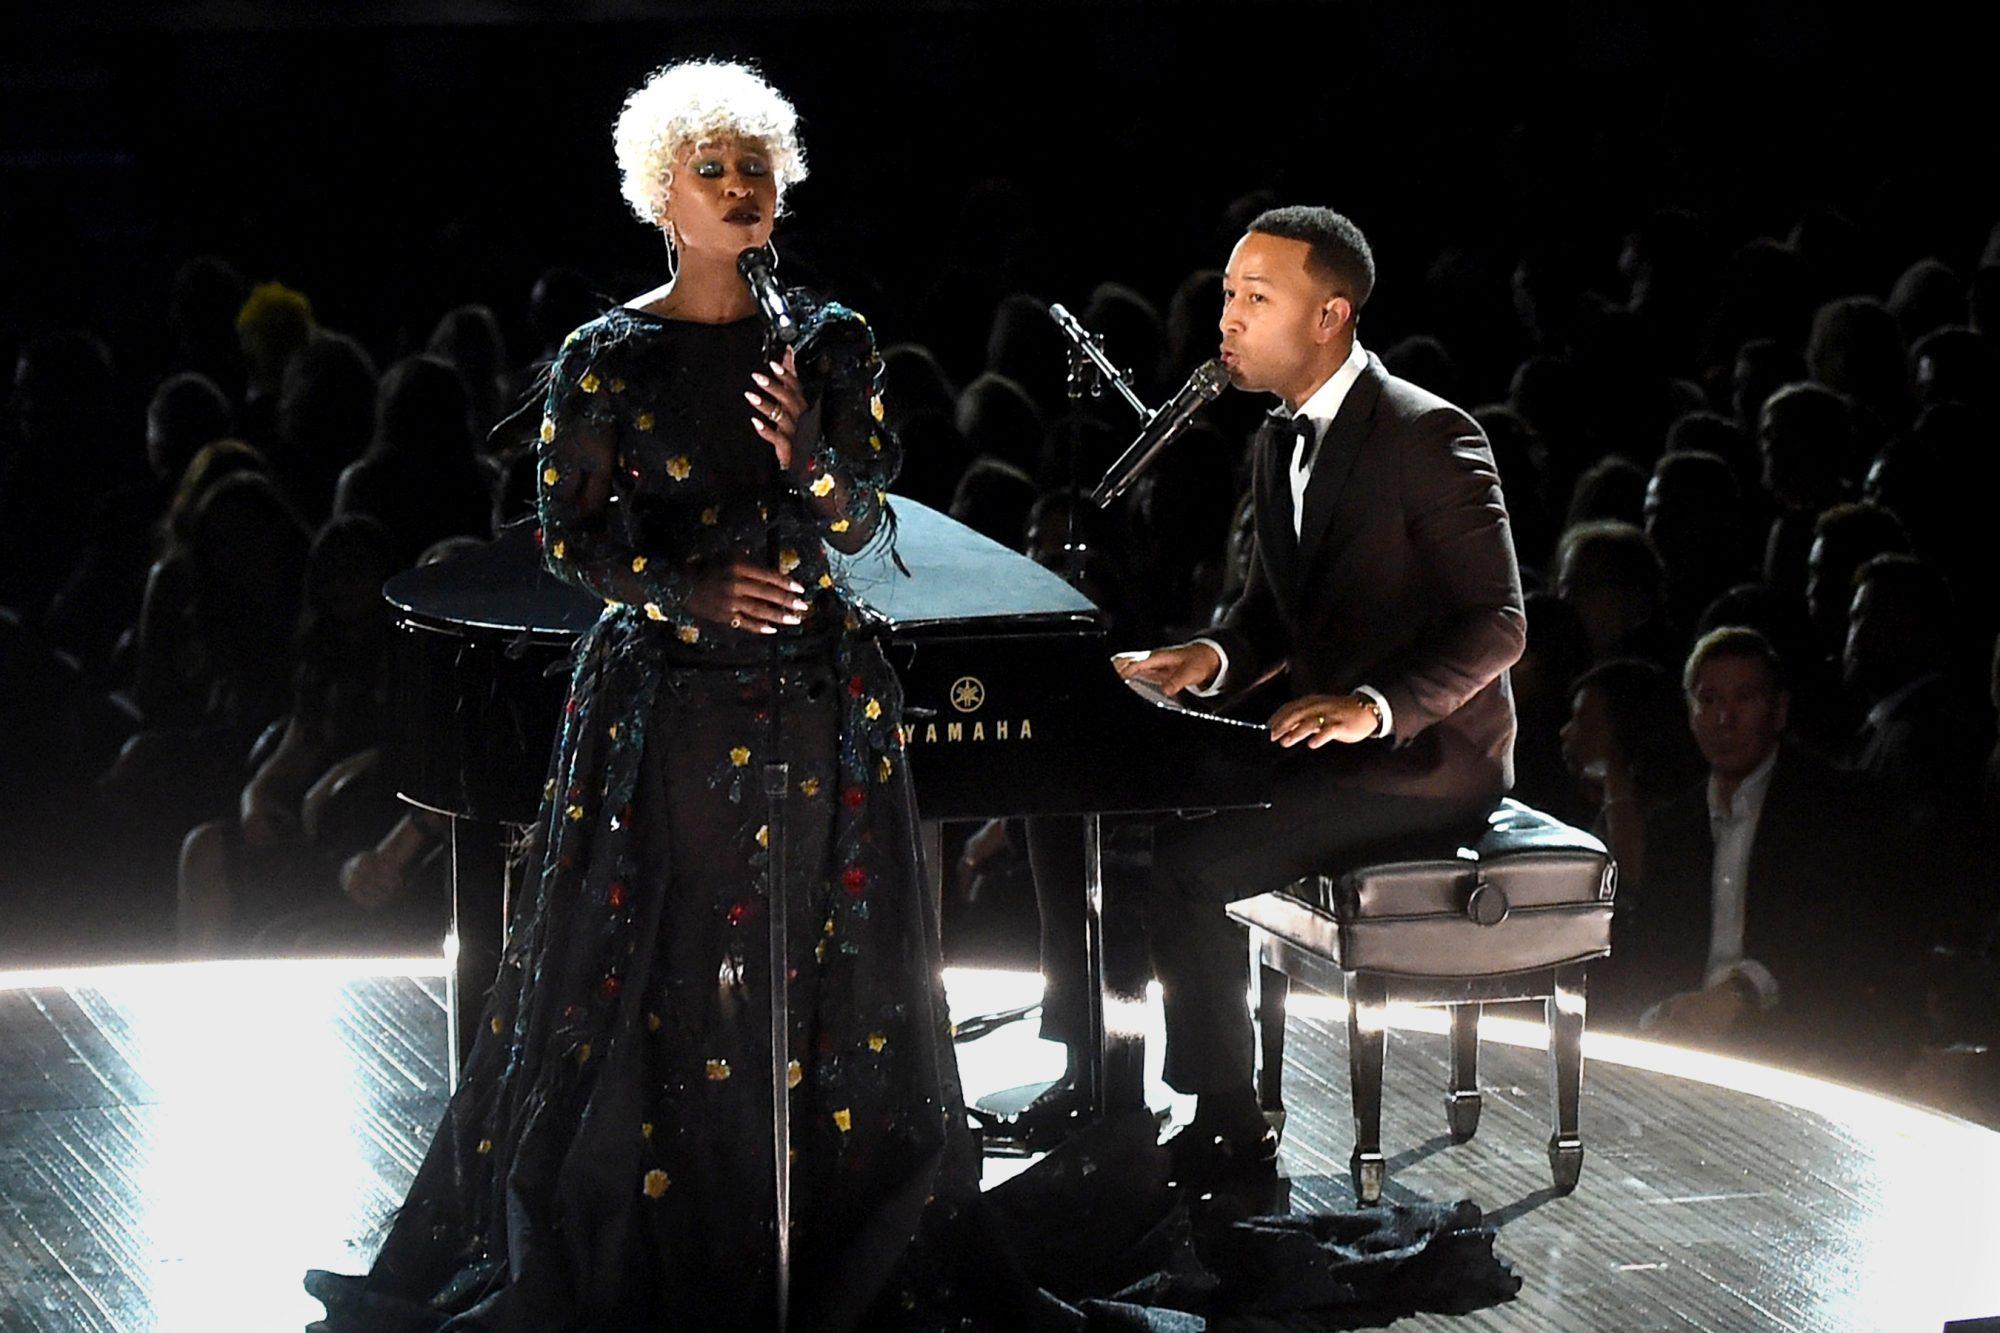 Cynthia Erivo and John Legend Grammy performance